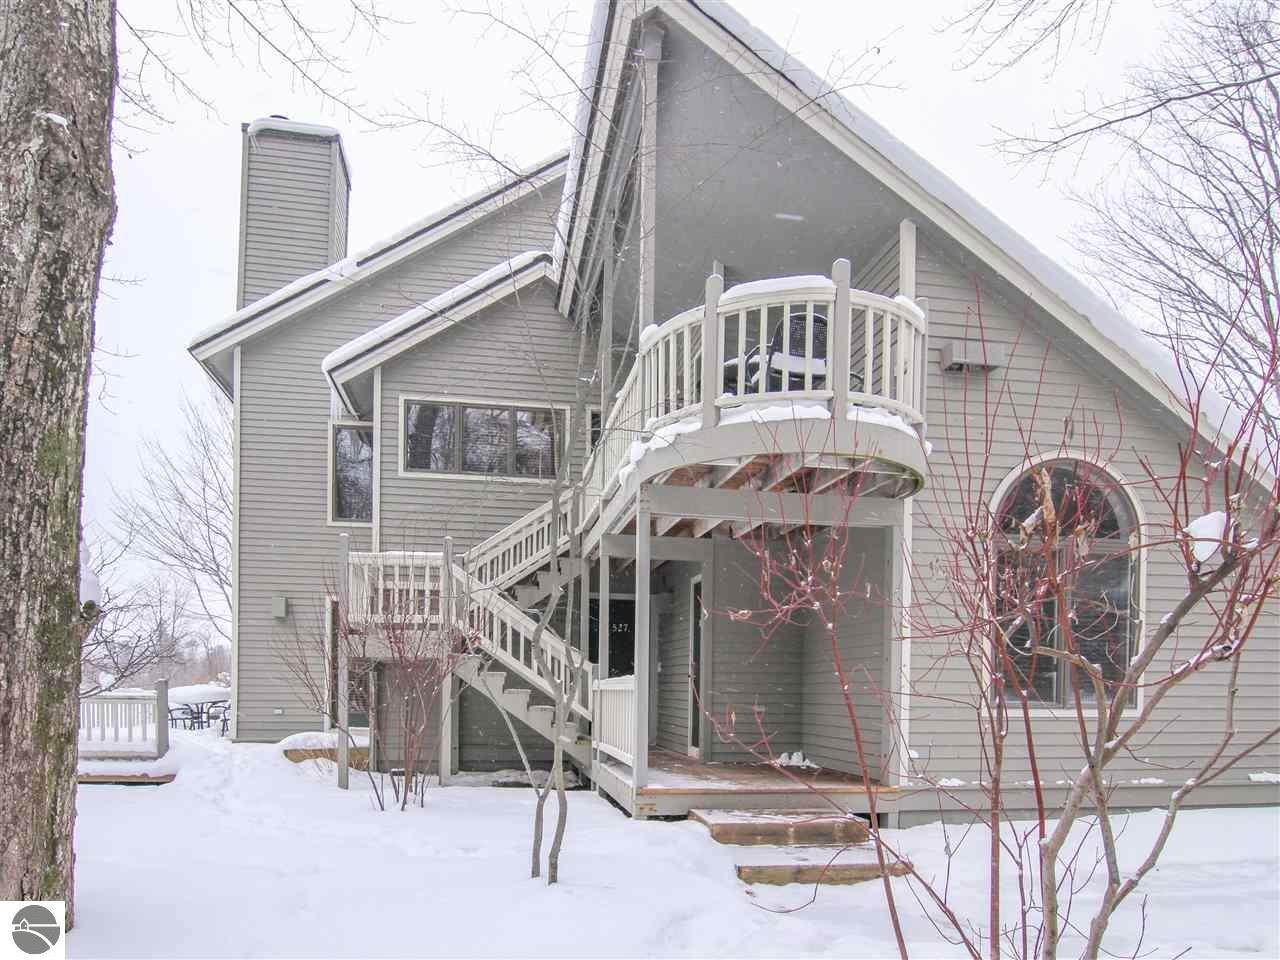 12495-Unit 527 Wintergreen Drive - Photo 1